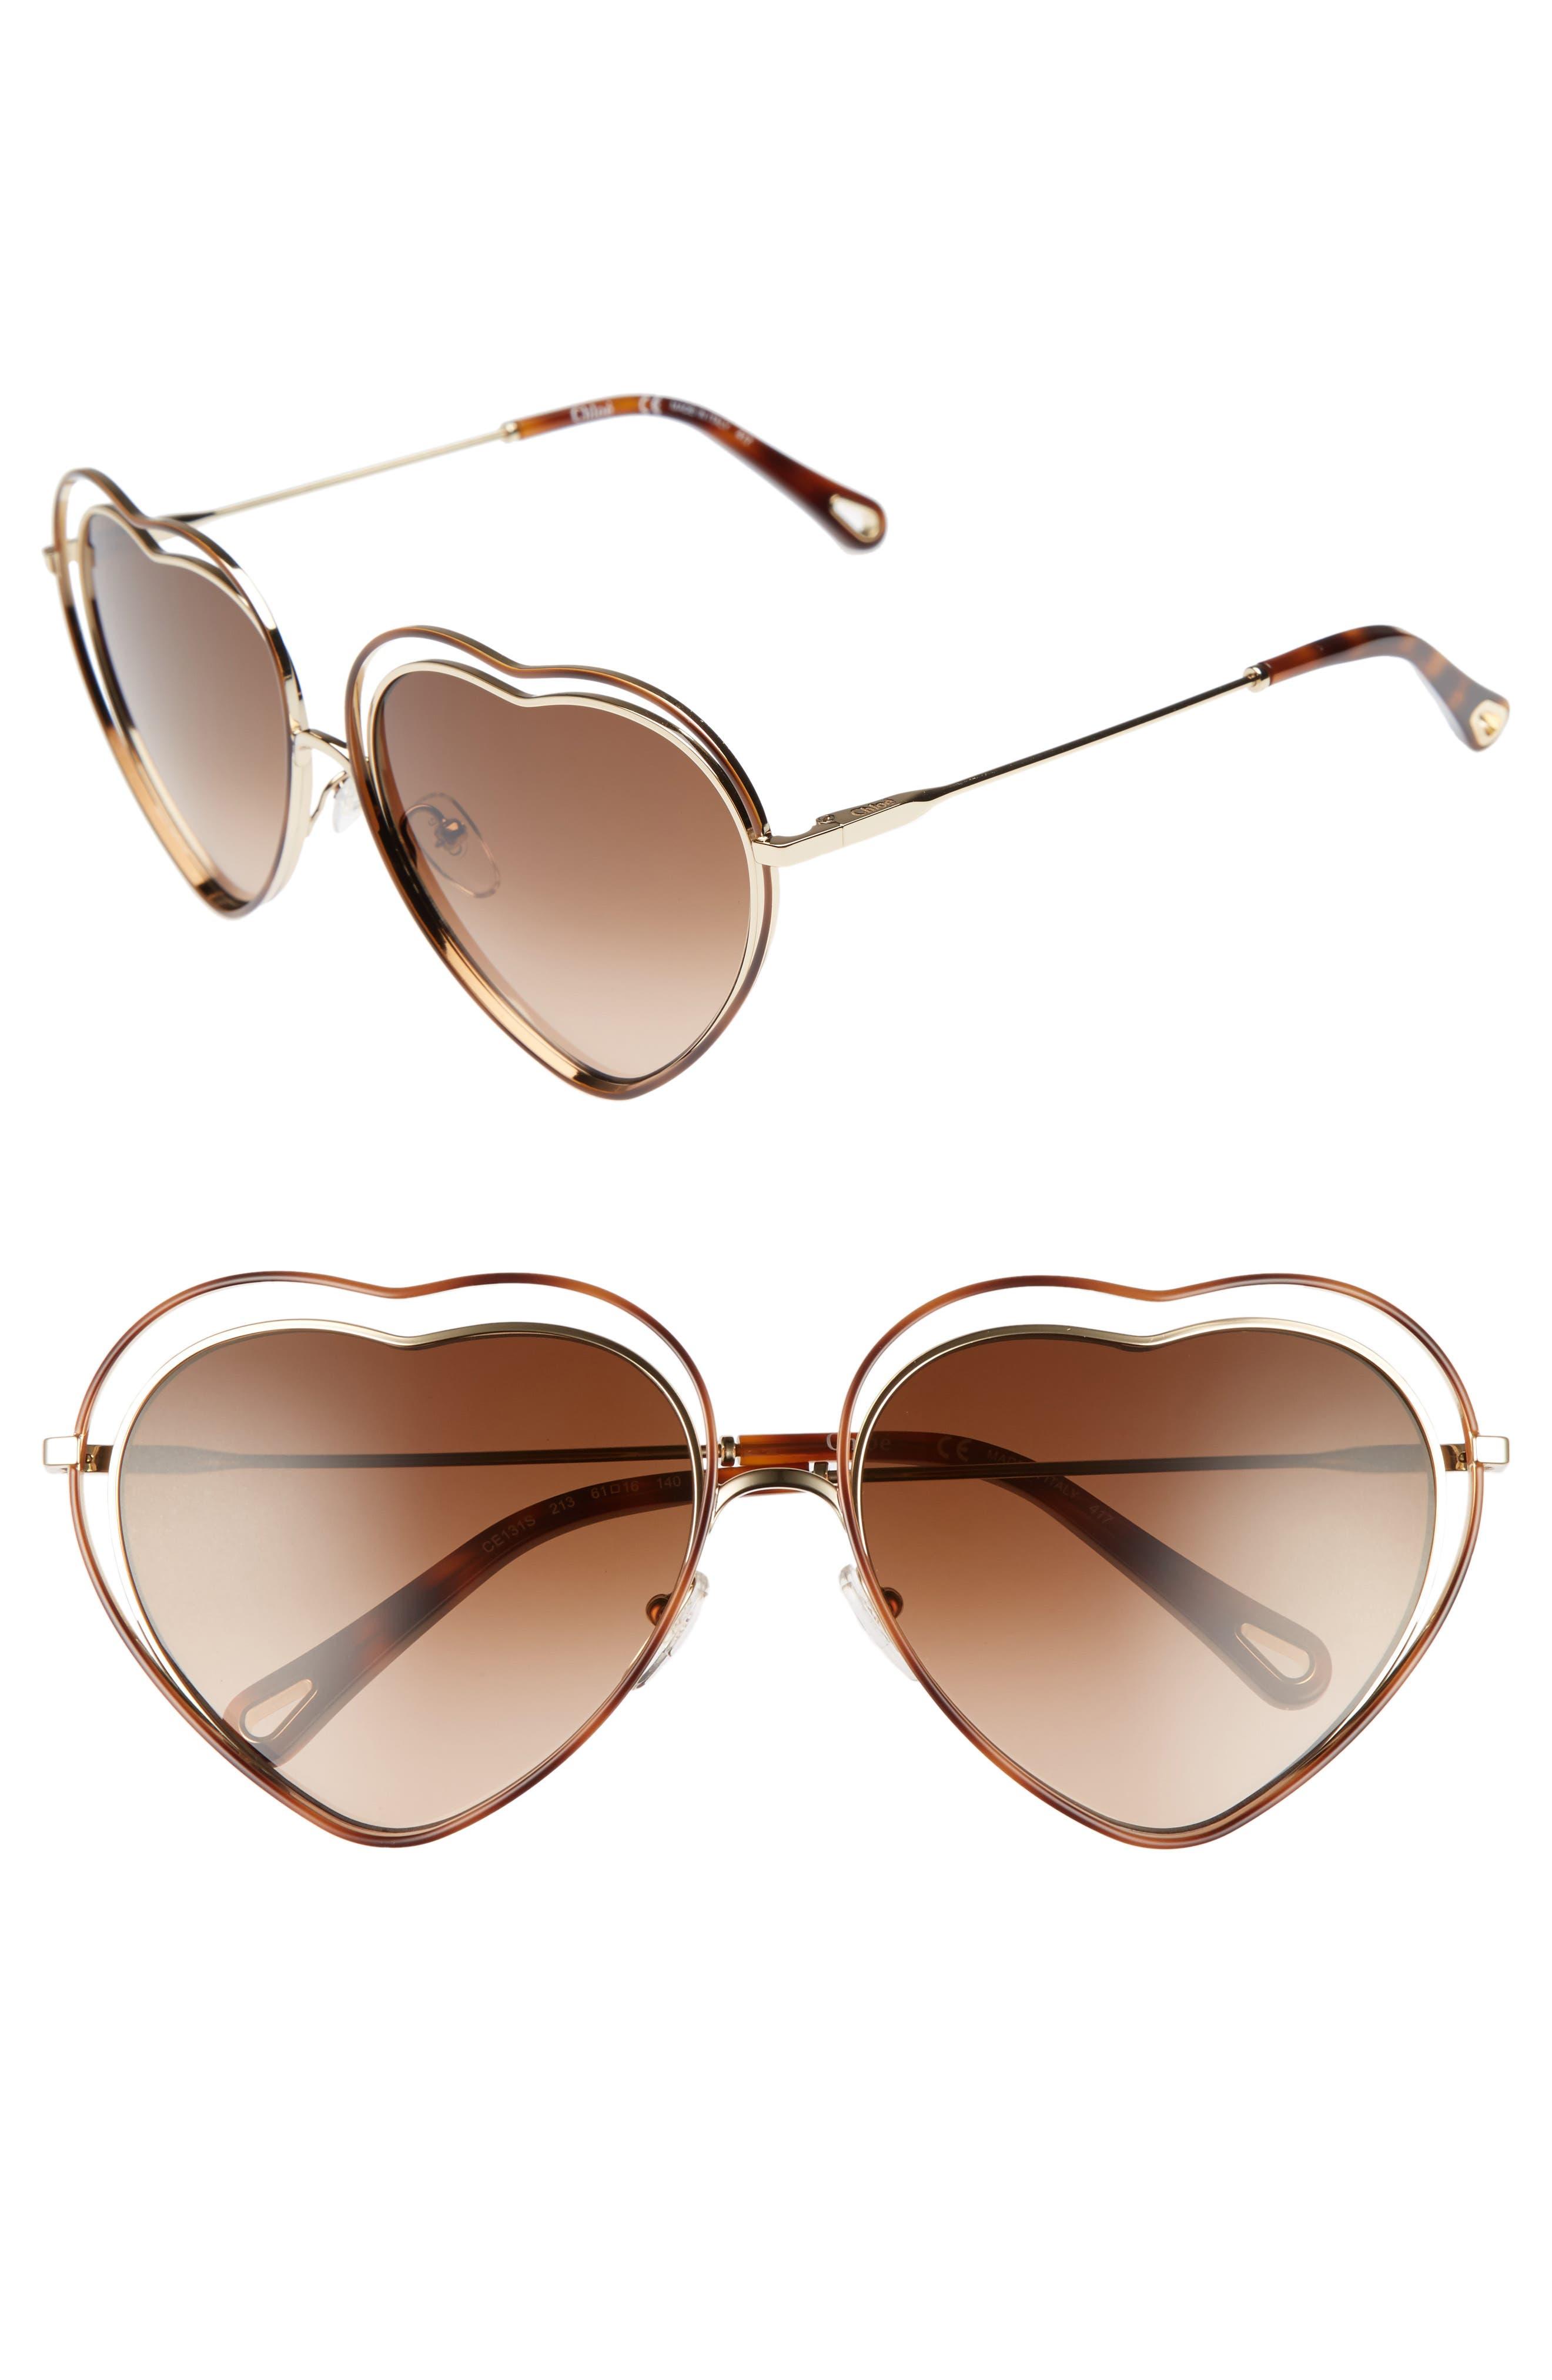 Poppy Love Heart Sunglasses,                             Main thumbnail 1, color,                             213